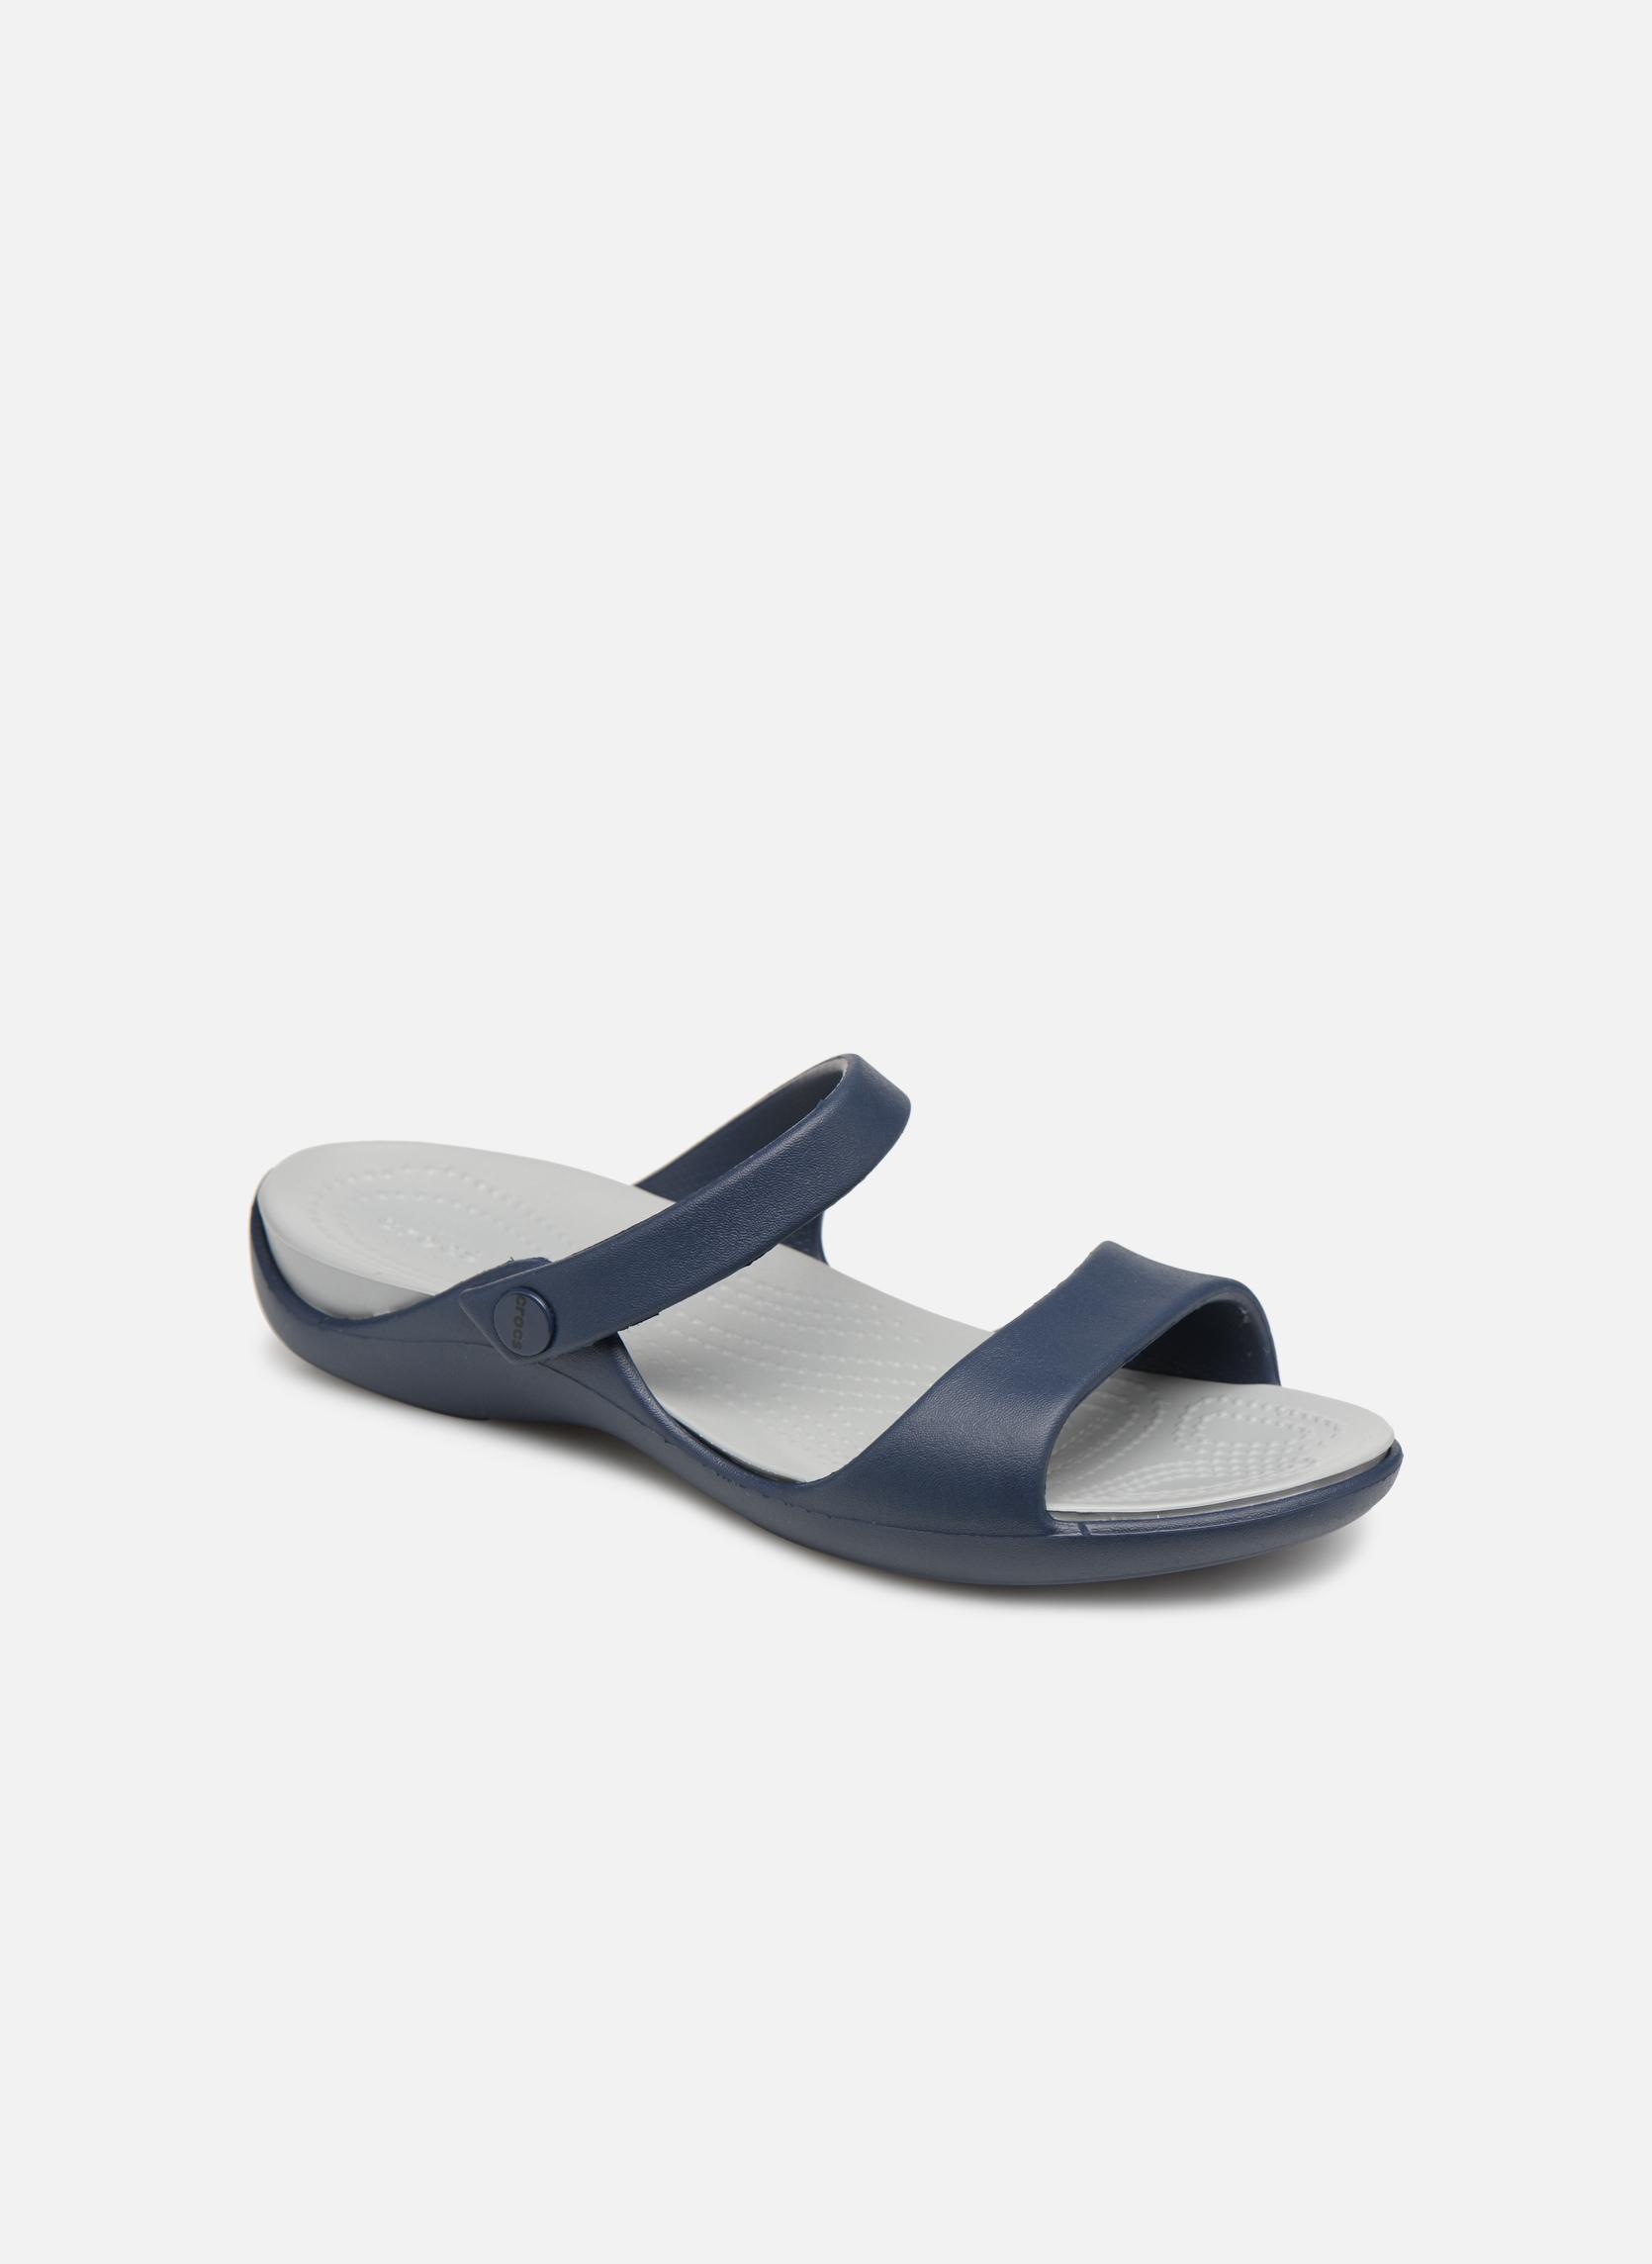 Wedges Crocs Blauw